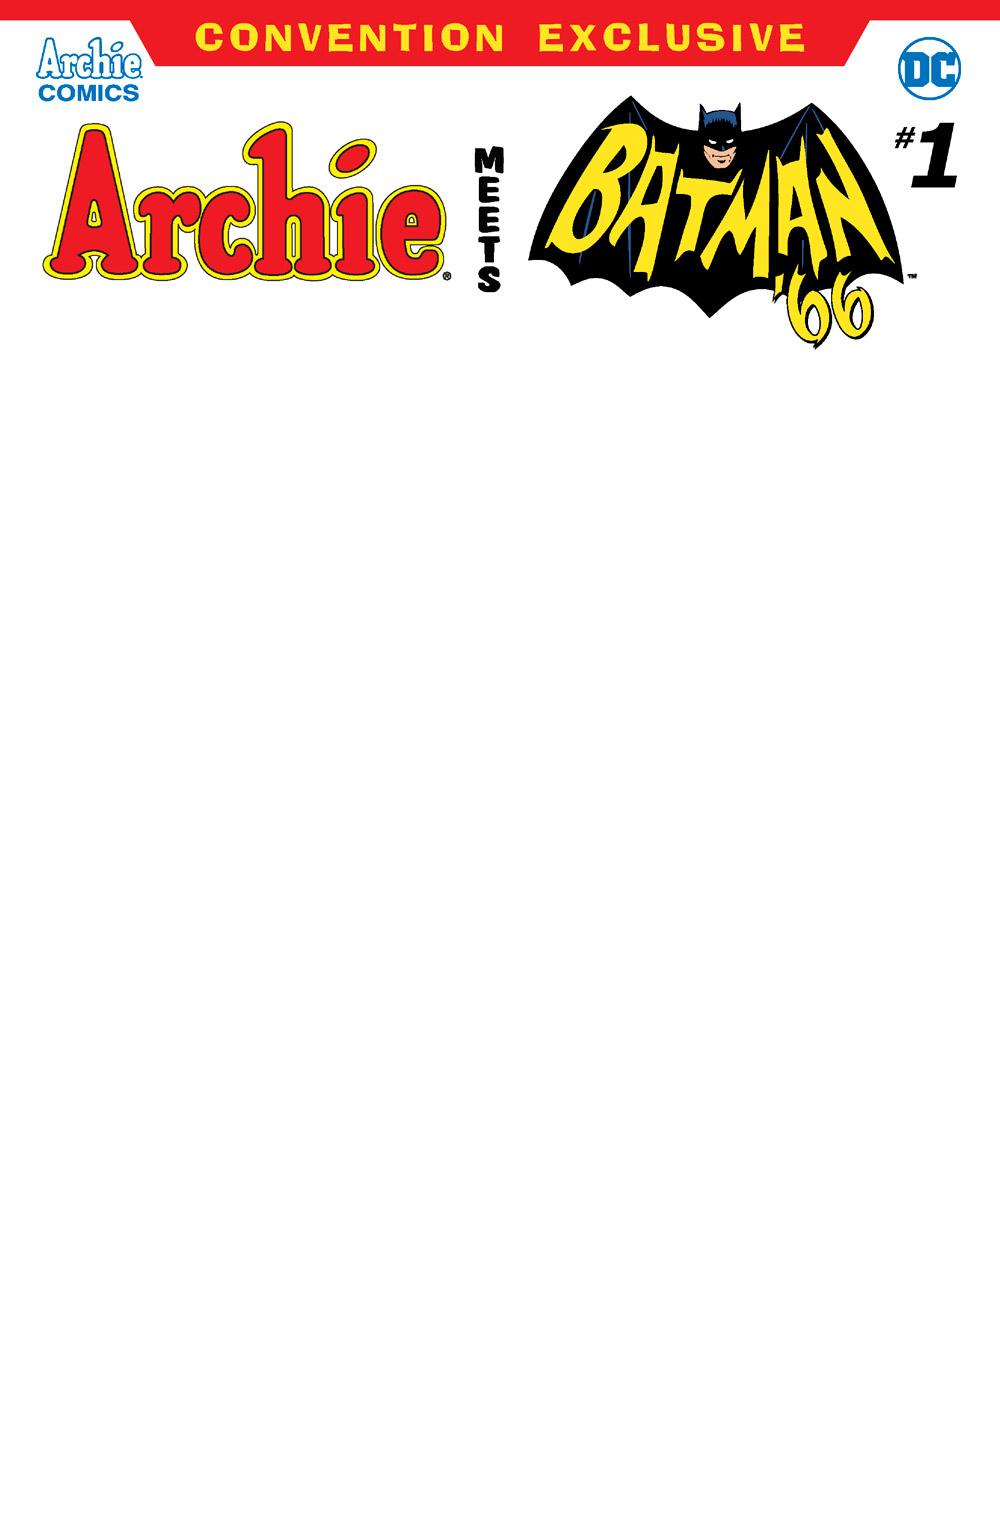 ArchieBatmanConVariant.jpg